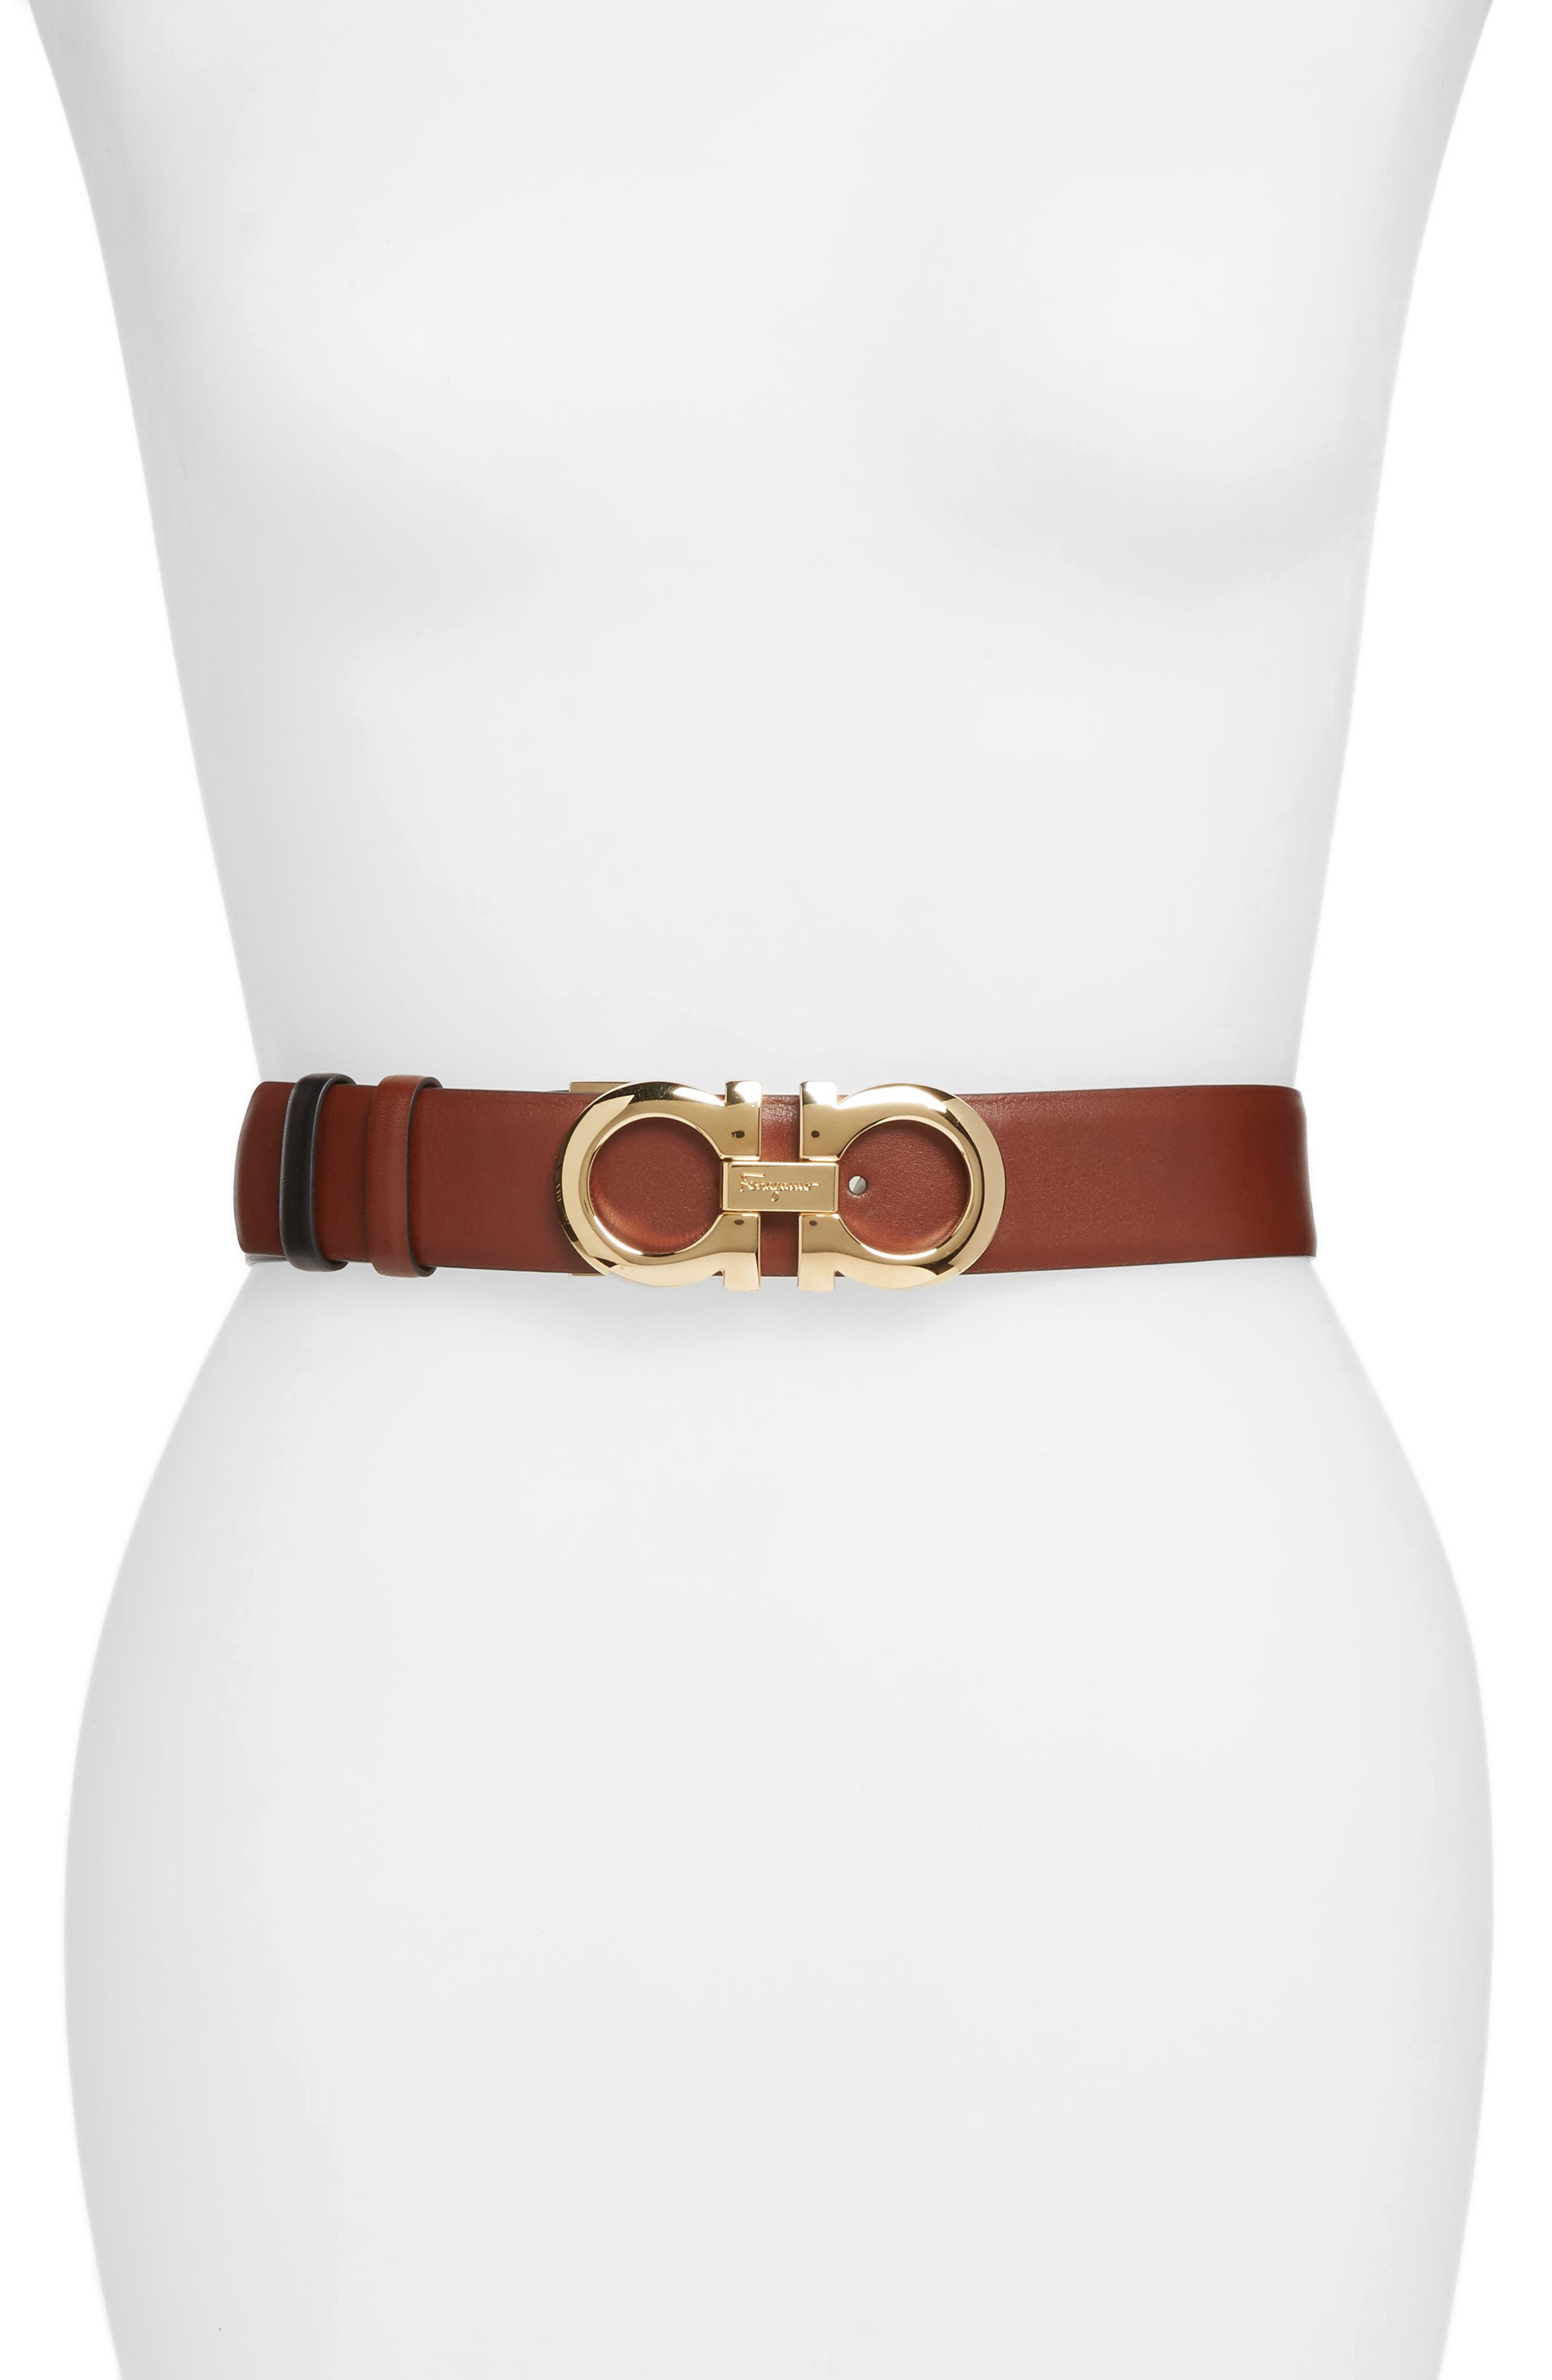 Salvatore Ferragamo Reversible Gancini Calfskin Leather Belt, Pecan